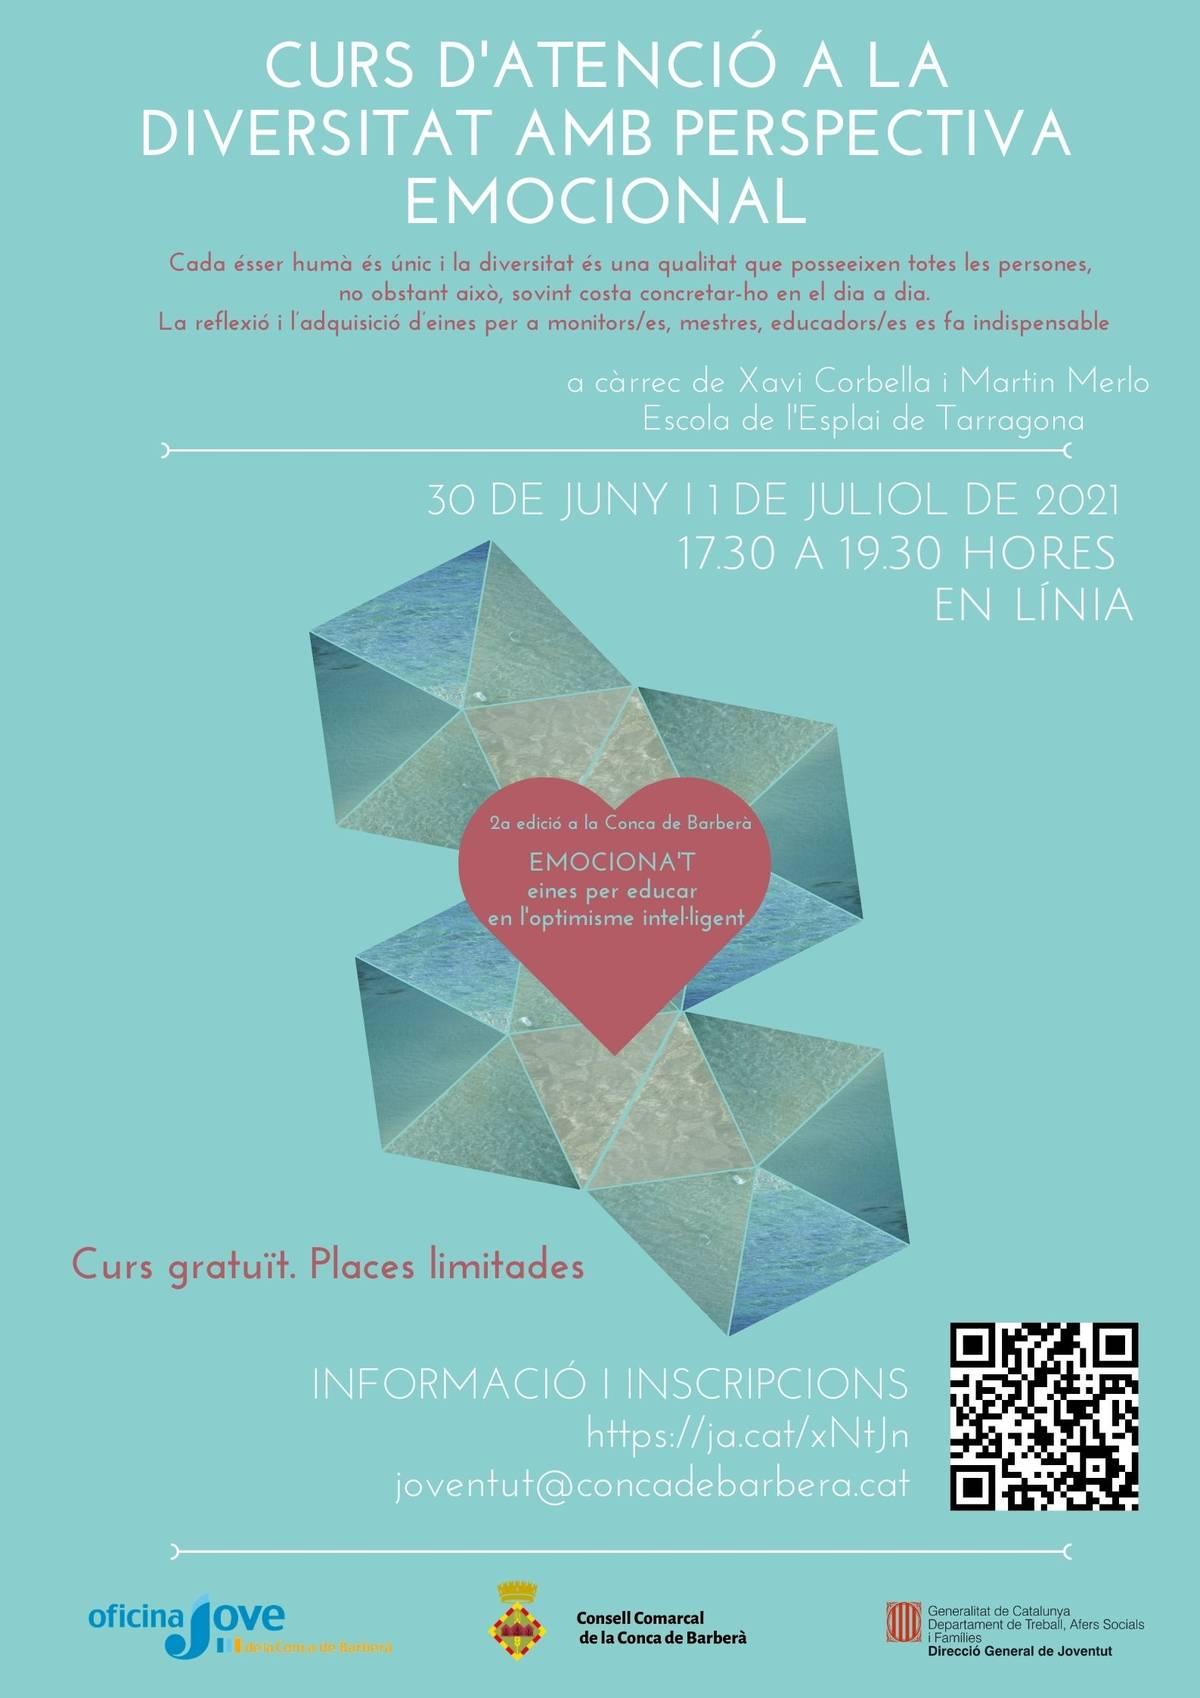 fundacio siurana escola esplai; Tarragona